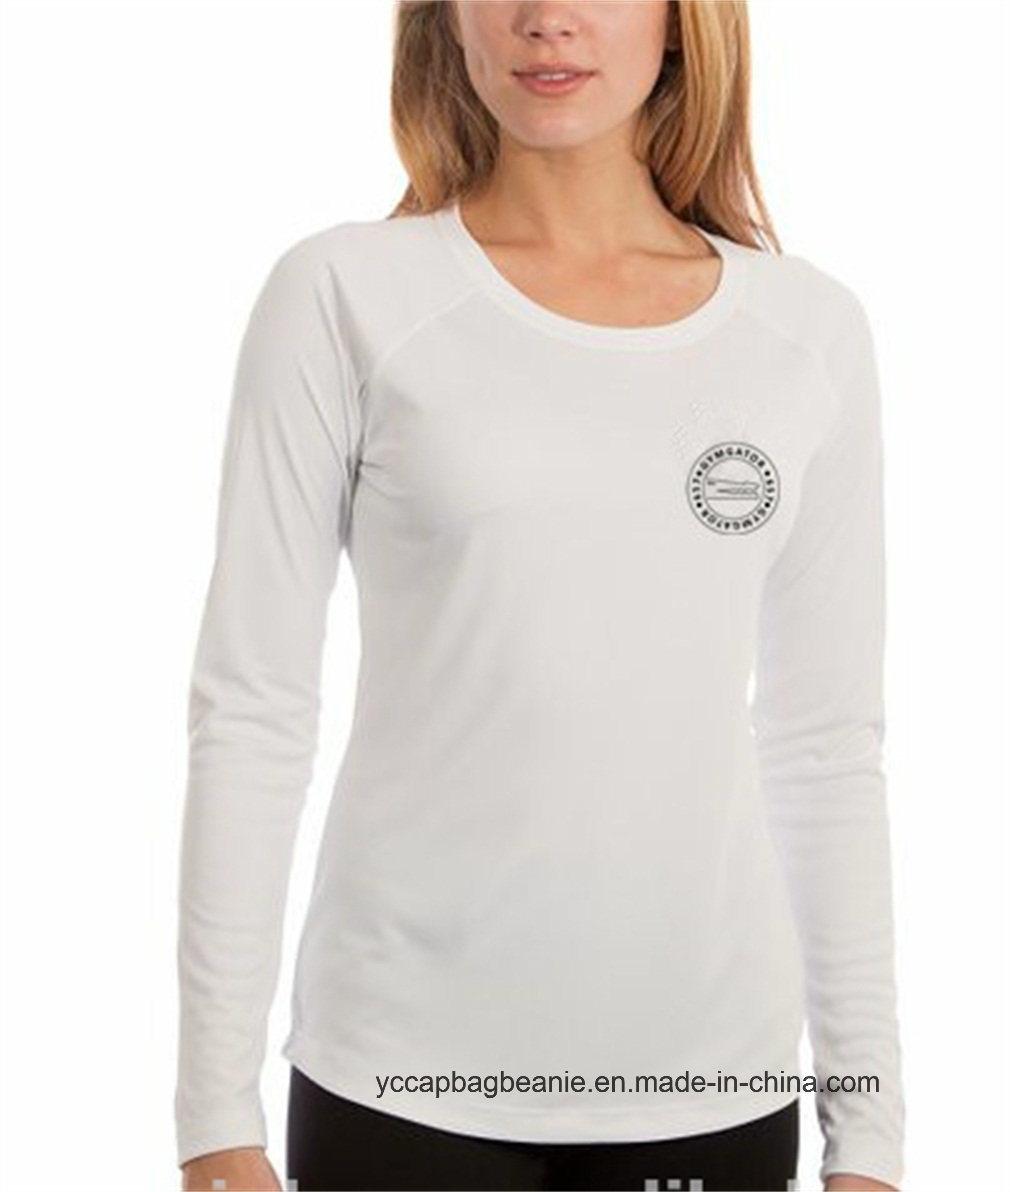 100% Microfiber Performance Womens Long Sleeve Shirt